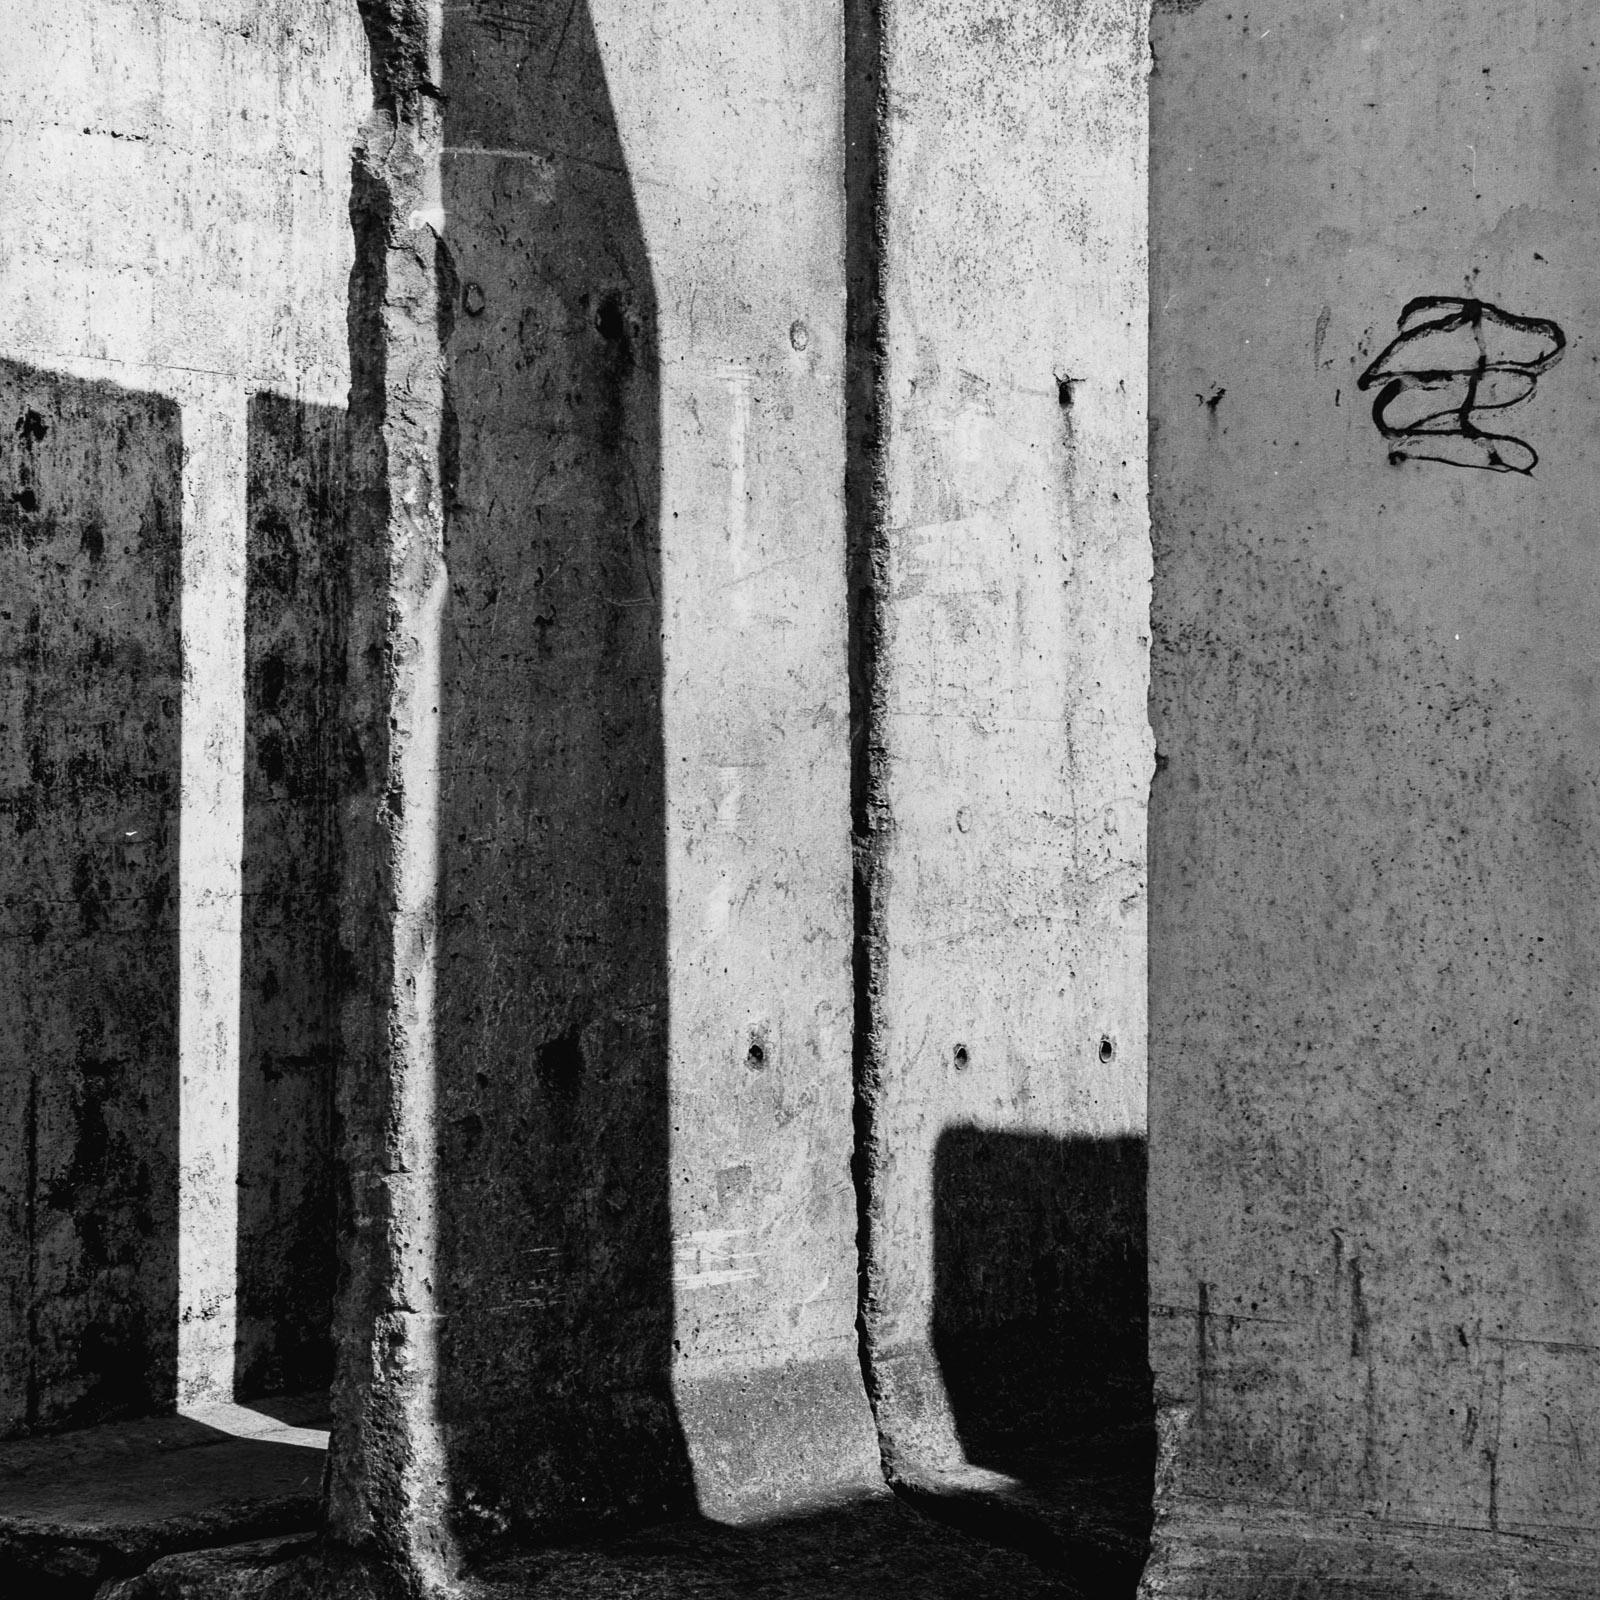 Concrete Walls, Hildesheim